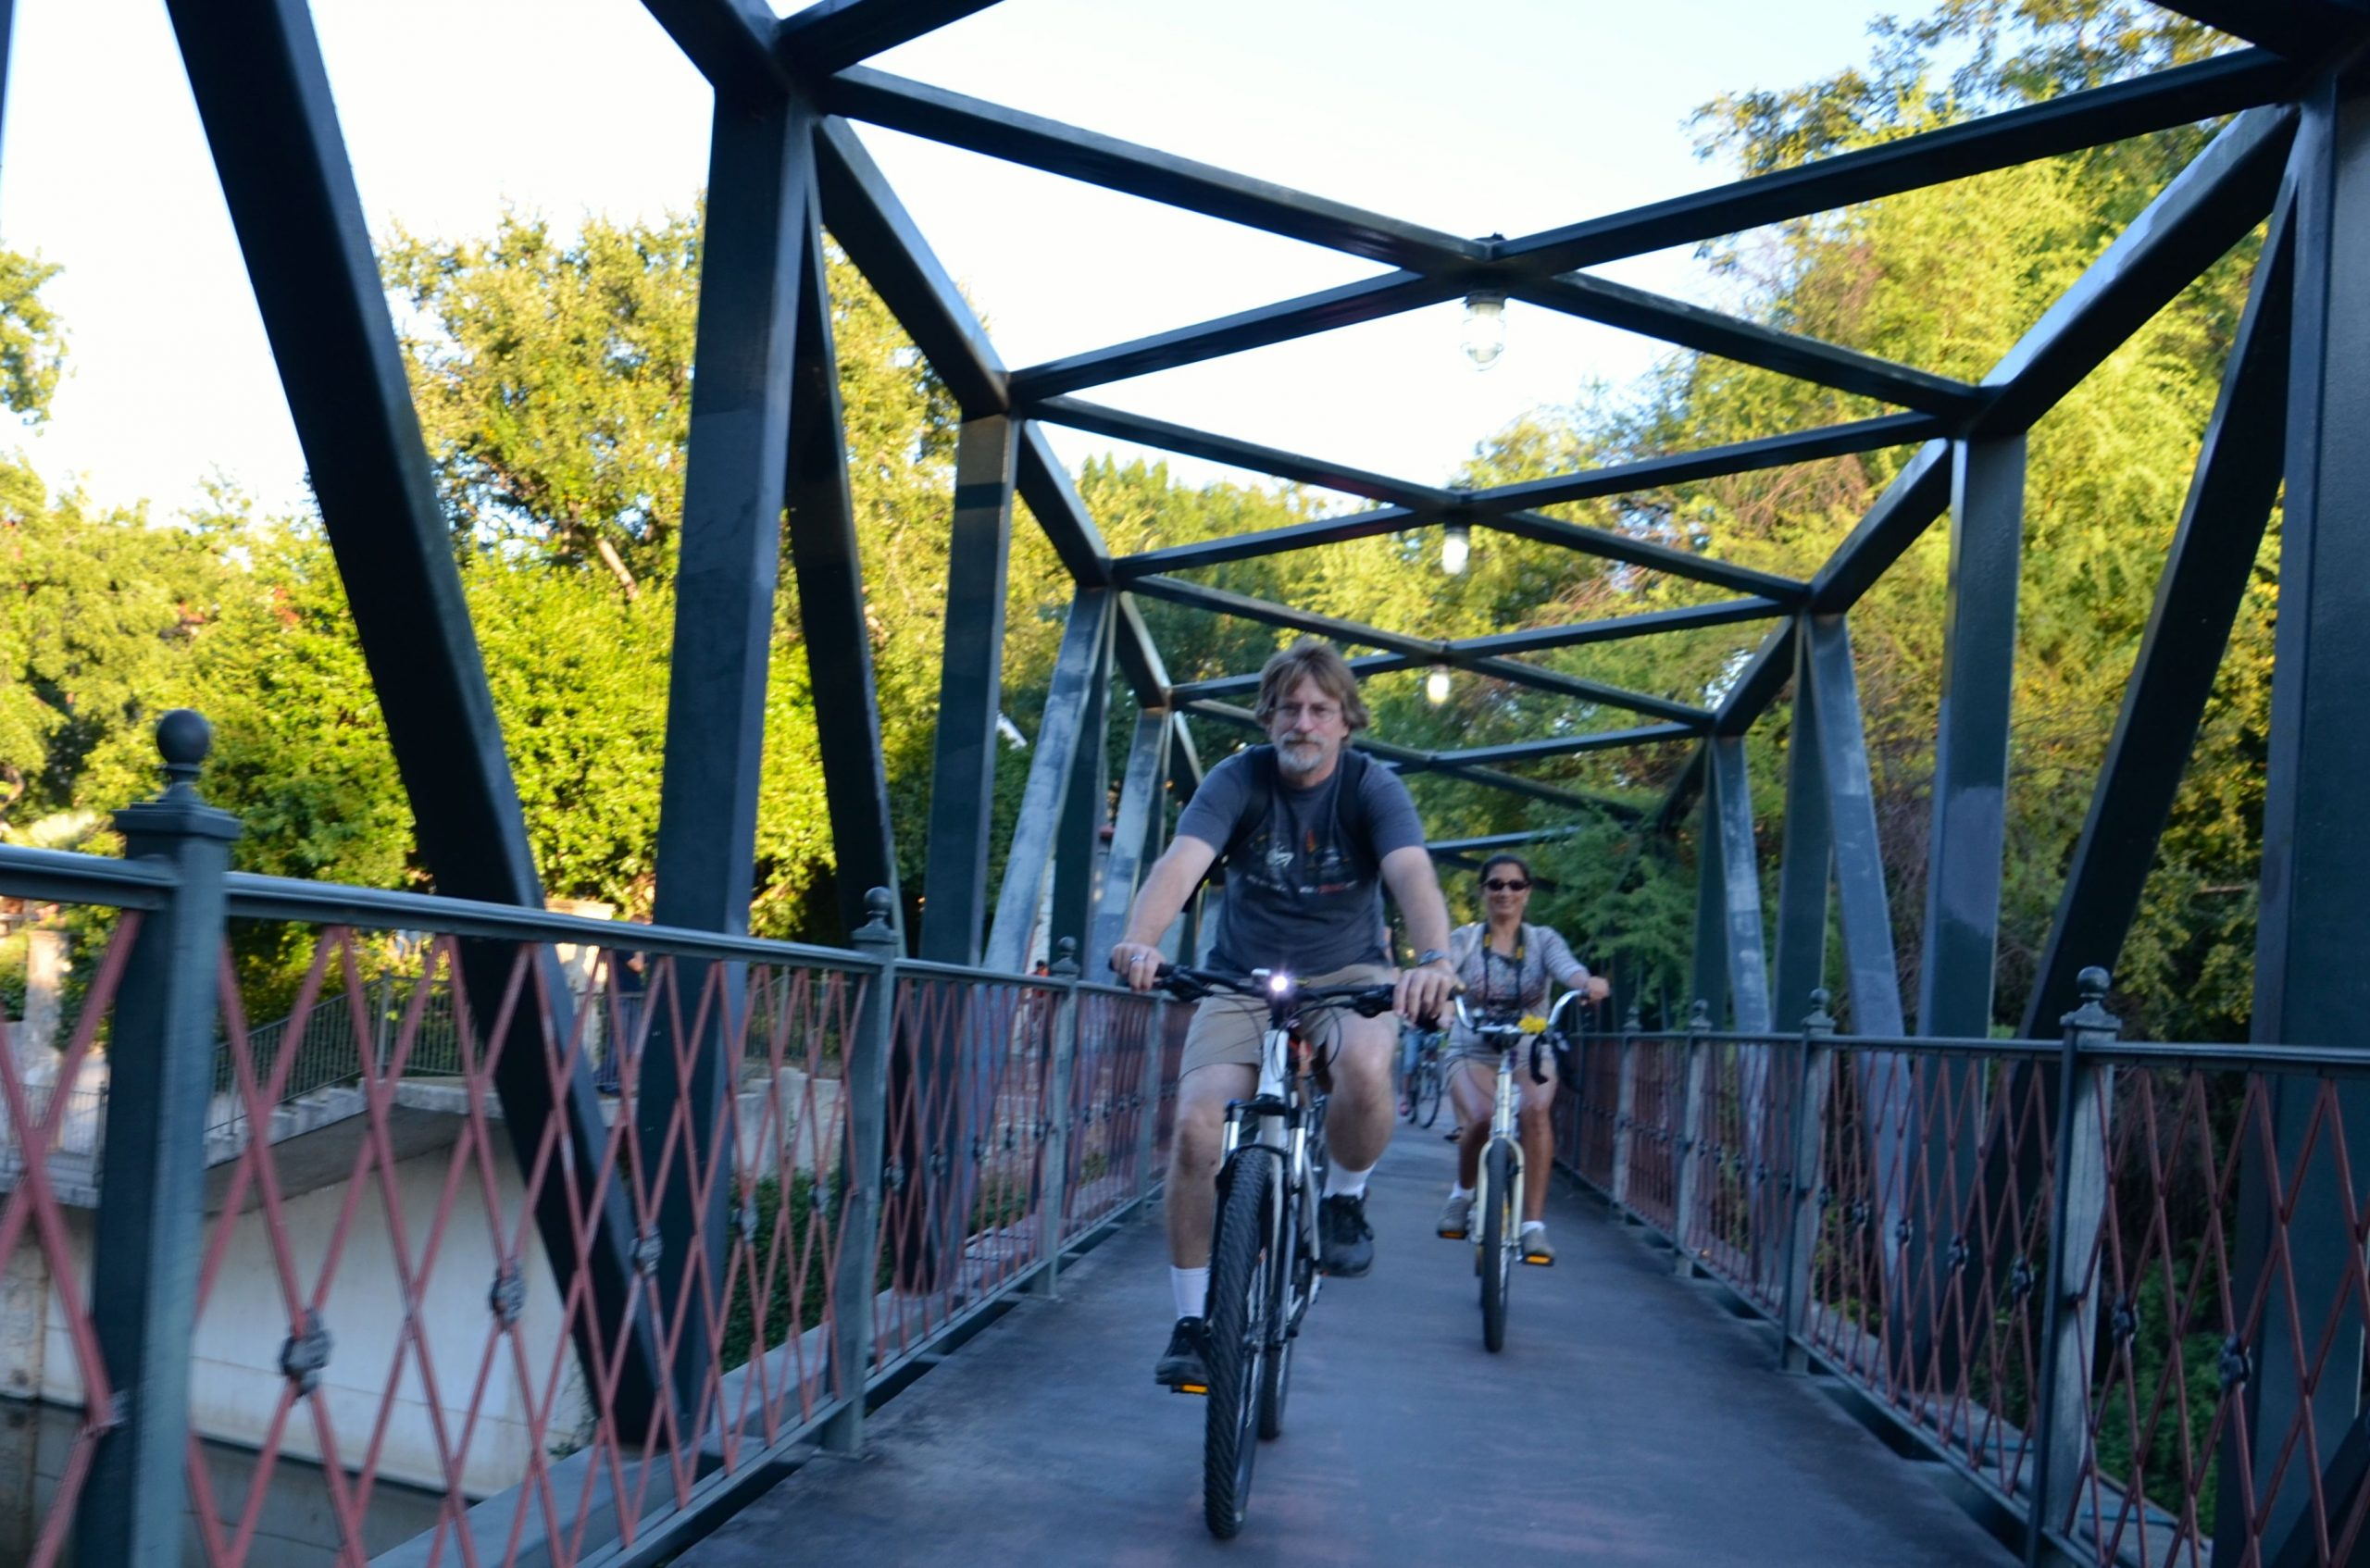 Something Monday rides over the San Antonio river via the Johnson Street footbridge. Photo by Steve Wood.